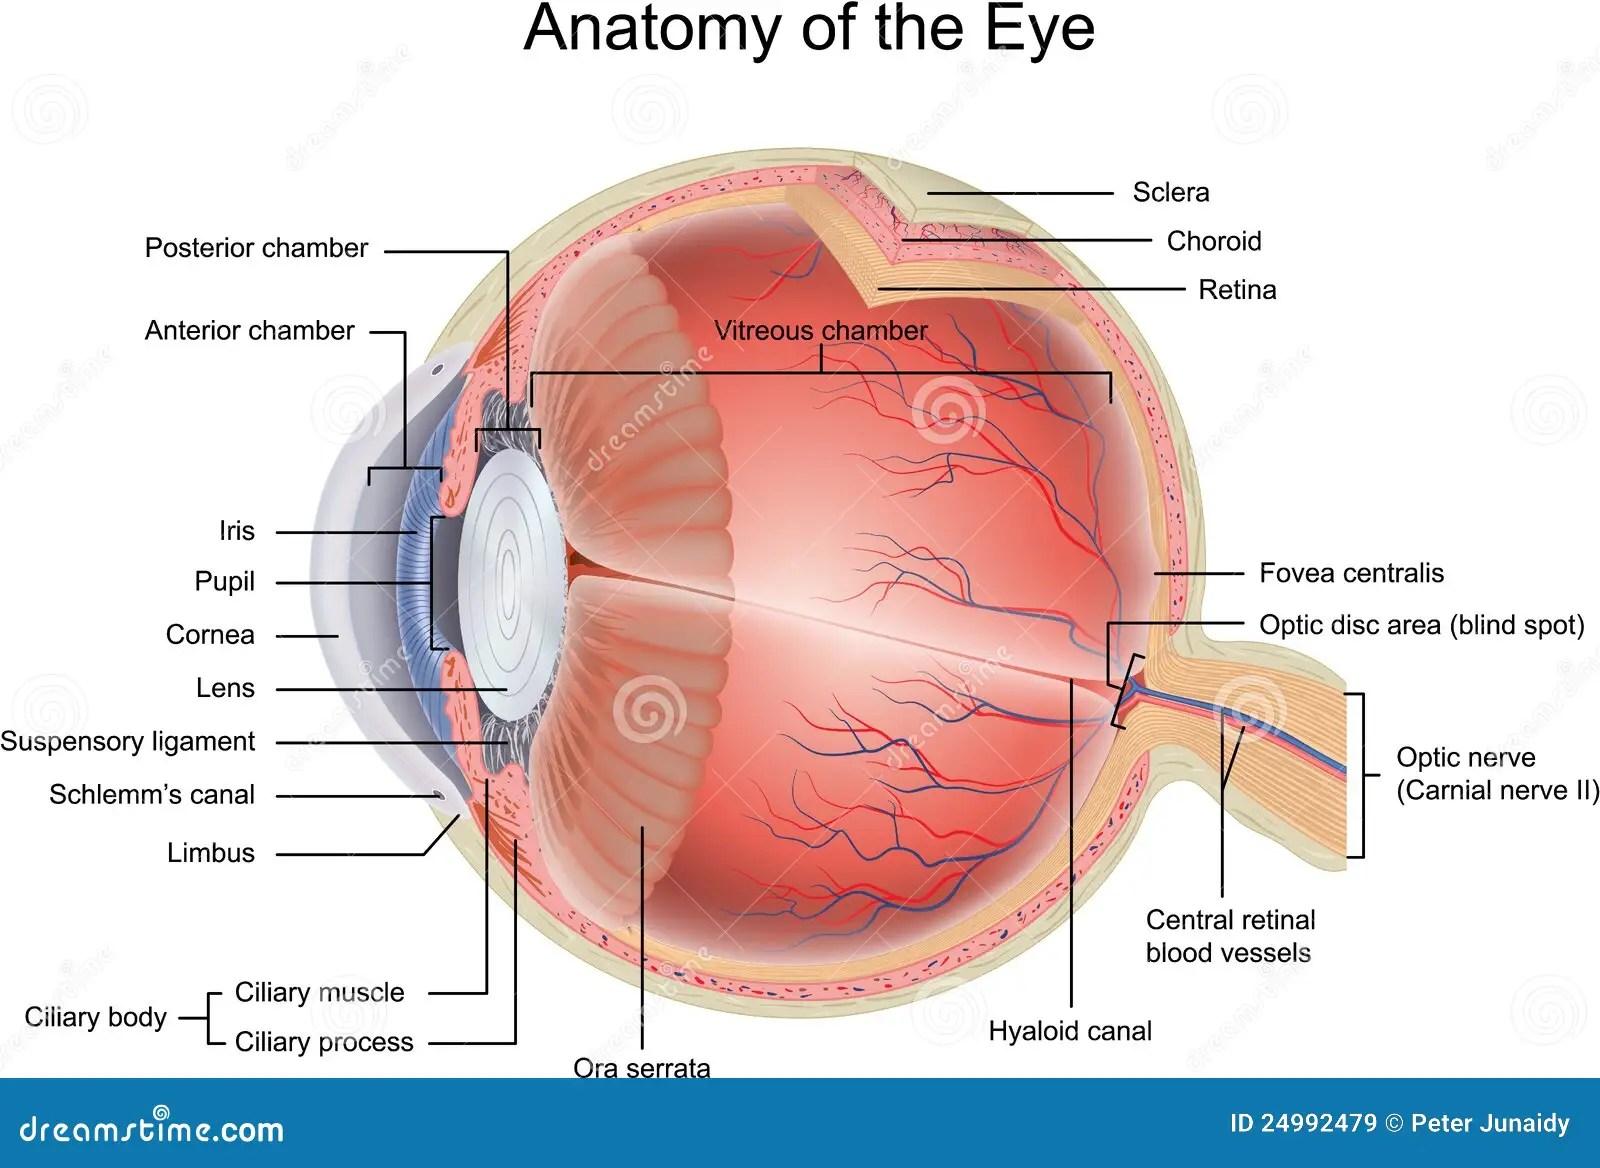 human eye diagram blind spot microsoft lync anatomy of the stock vector illustration biology